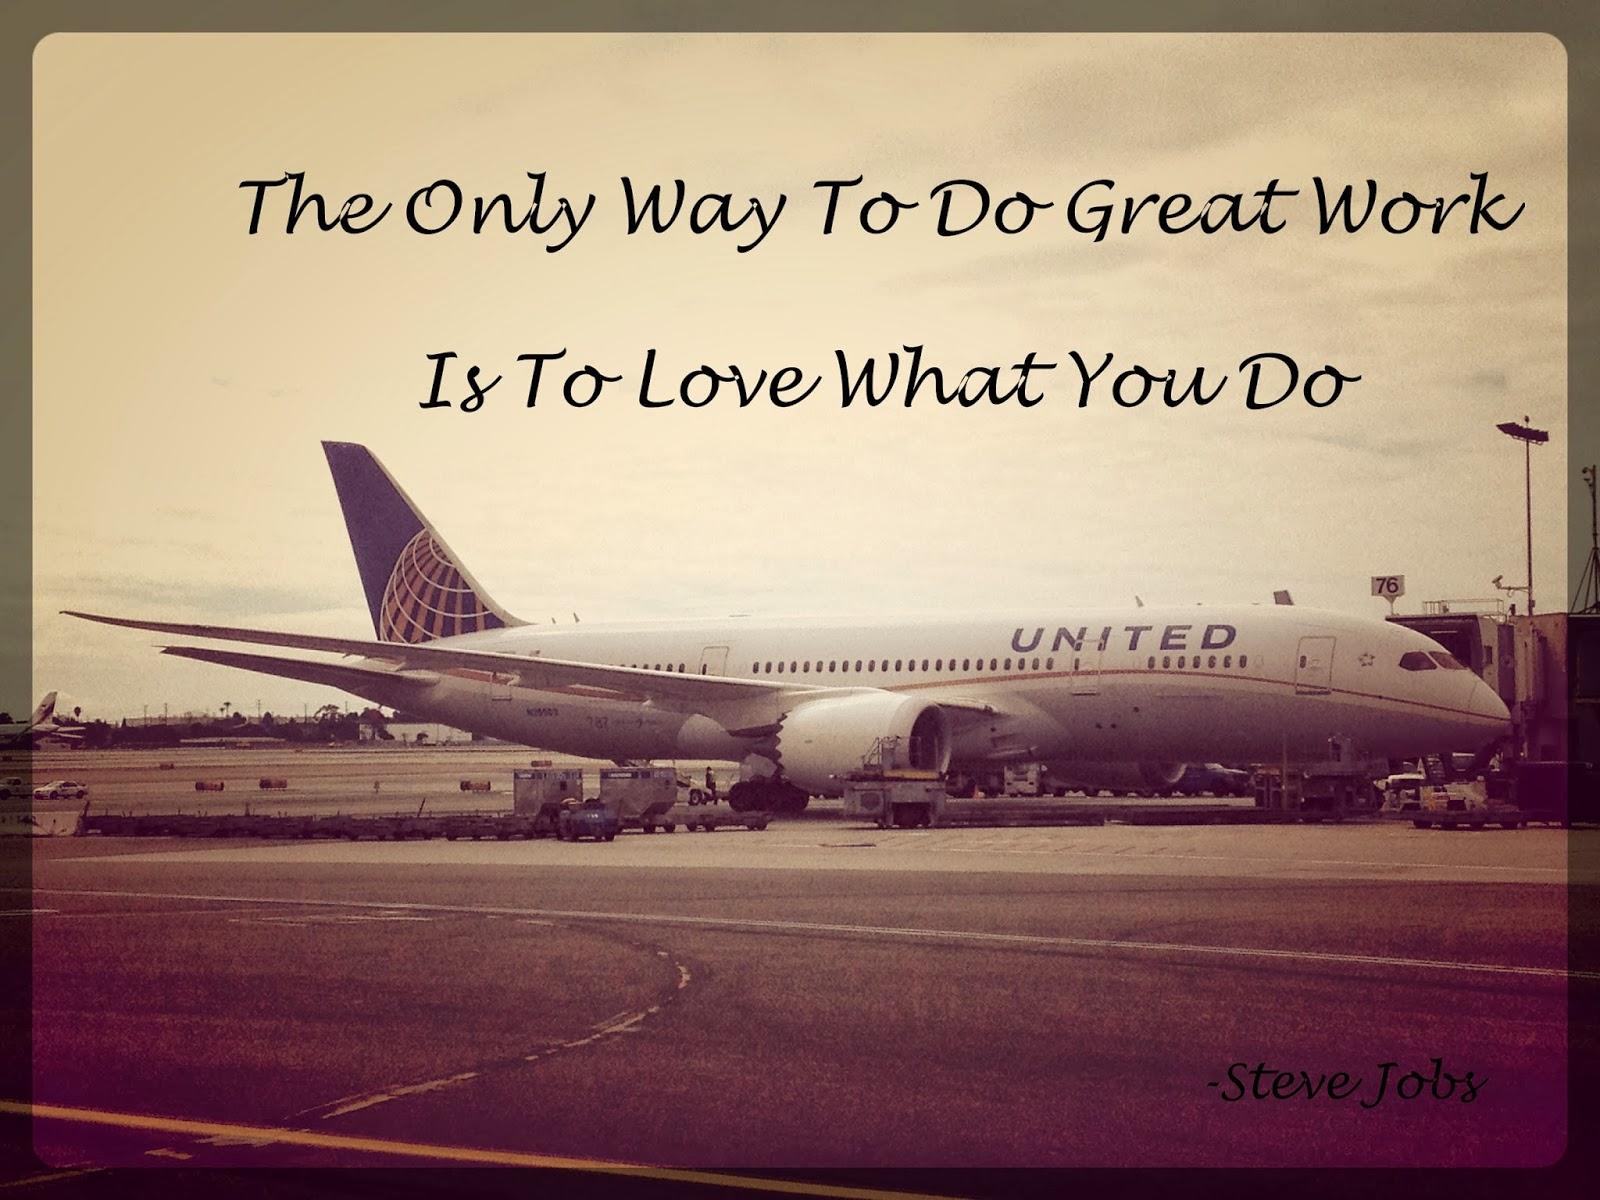 trendy pilots motivational quotes pictures 2014